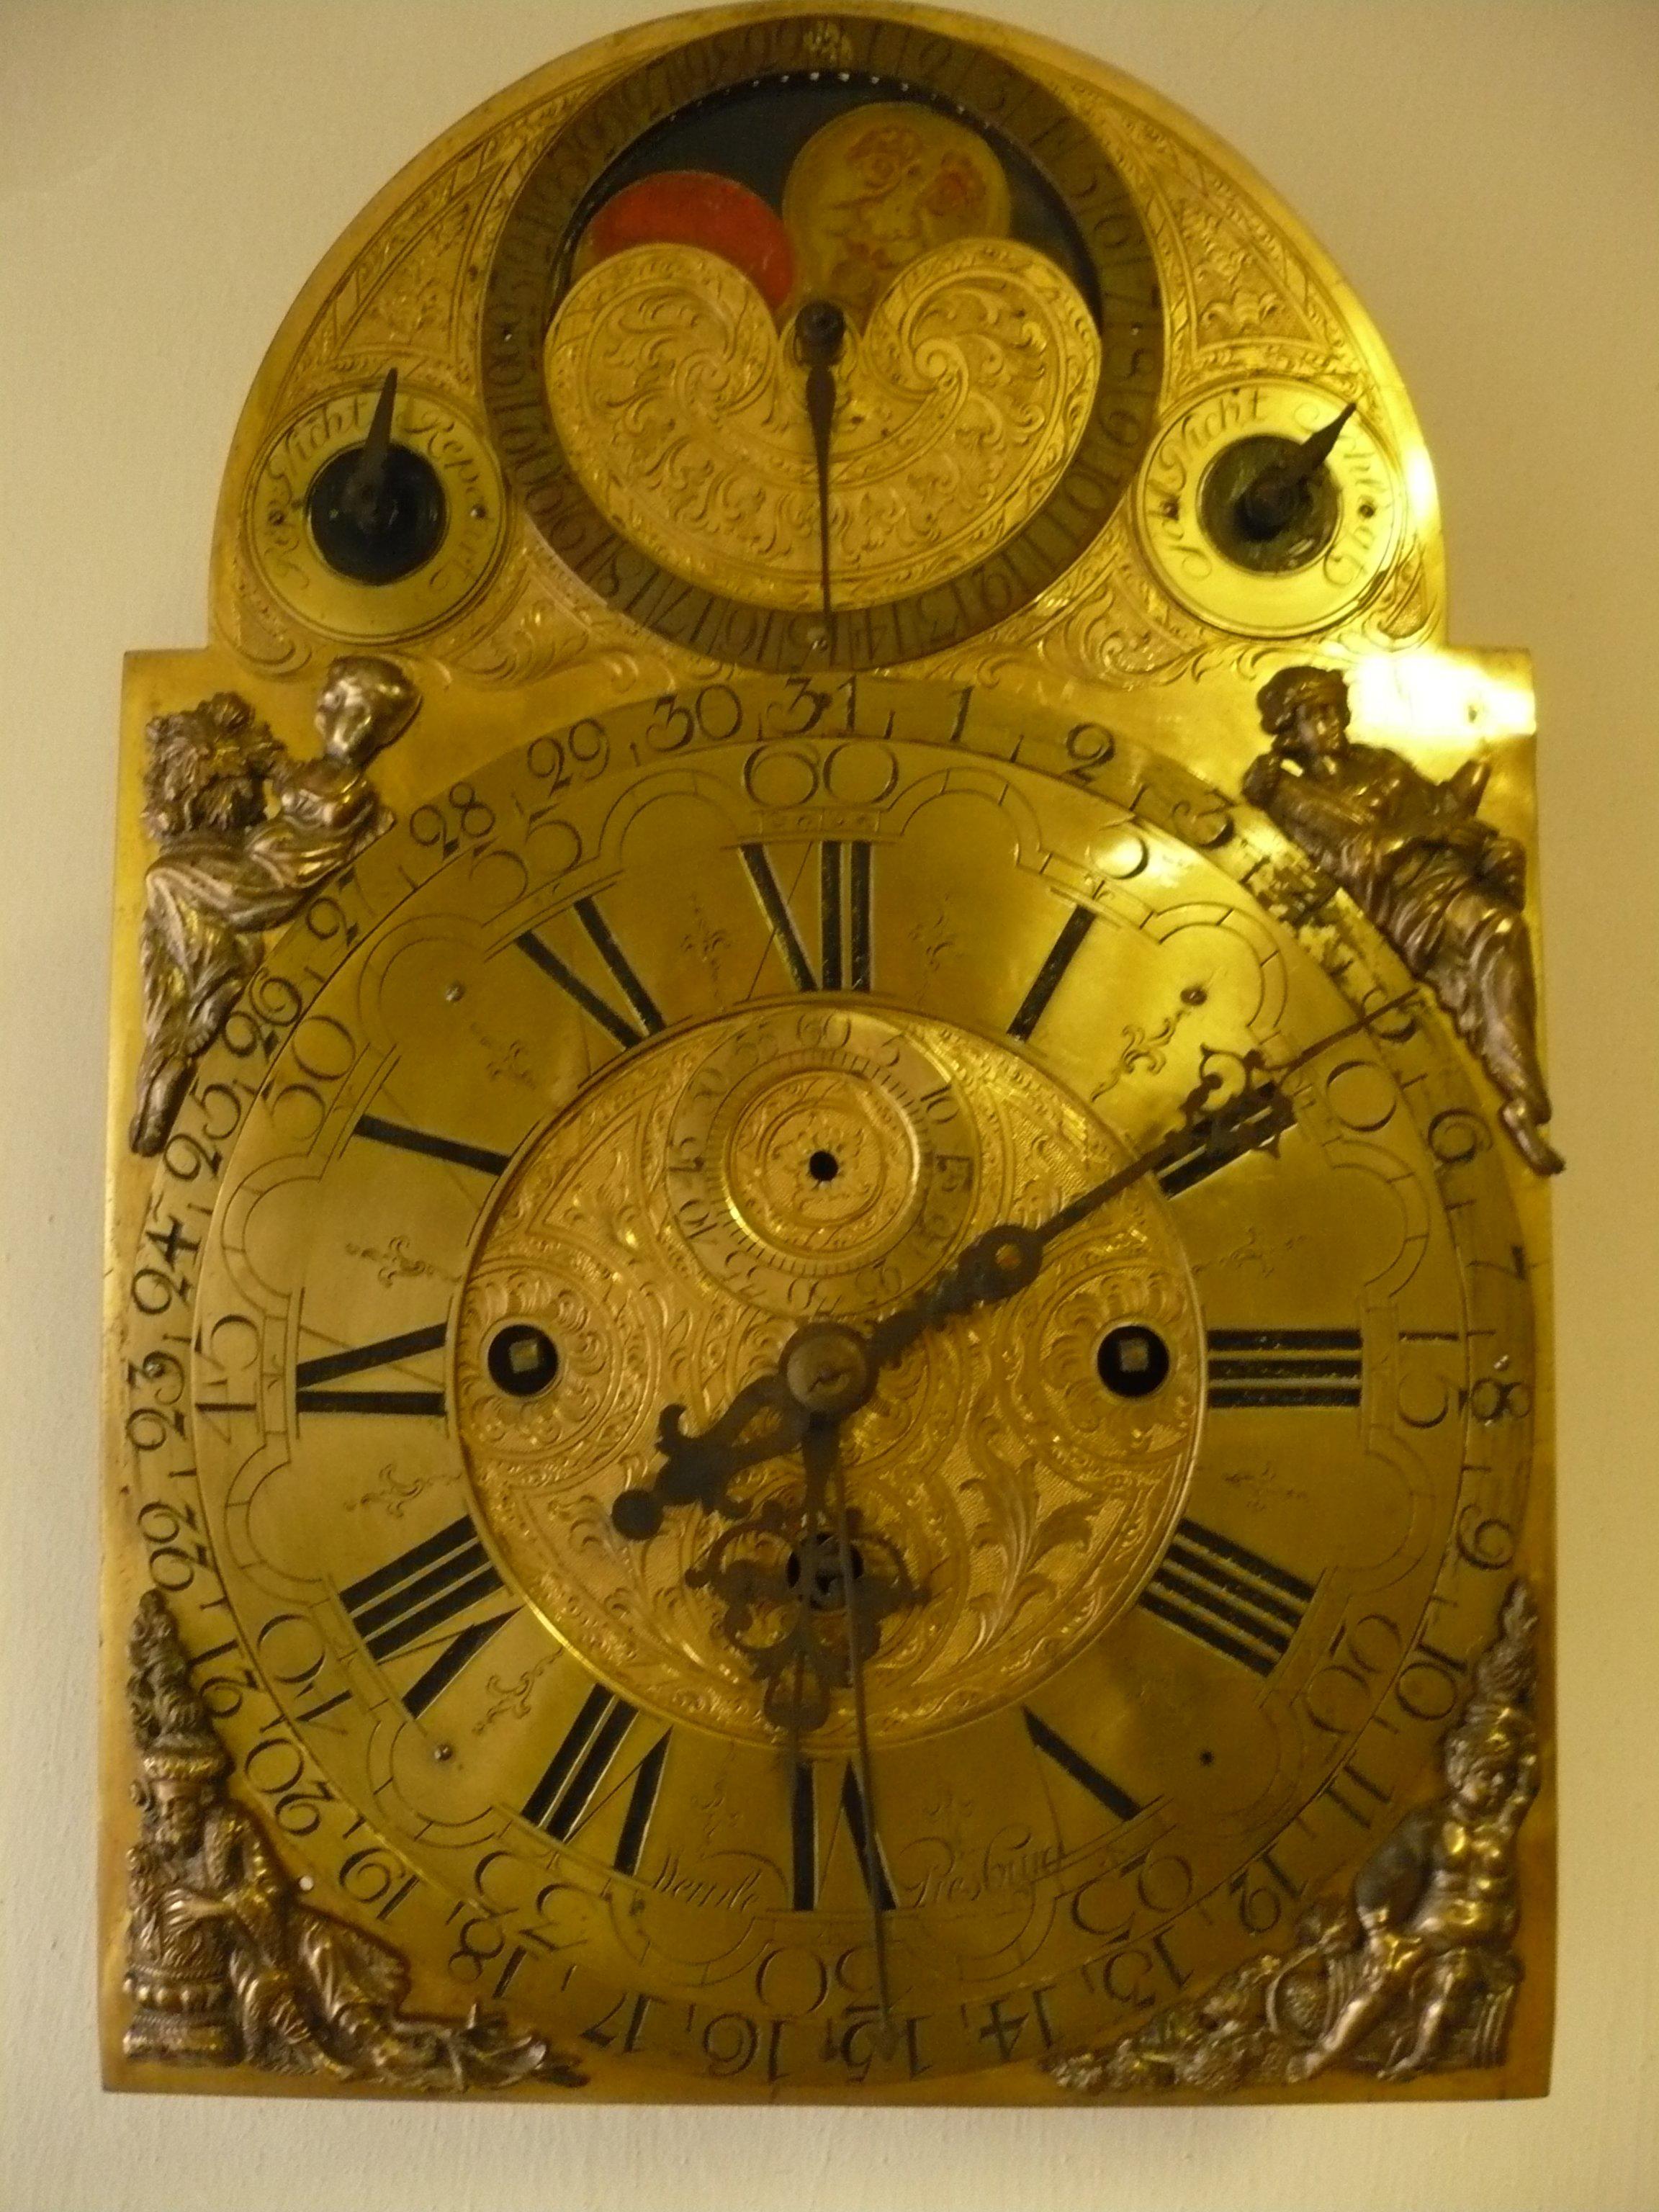 Bratislava - Clocks Museum